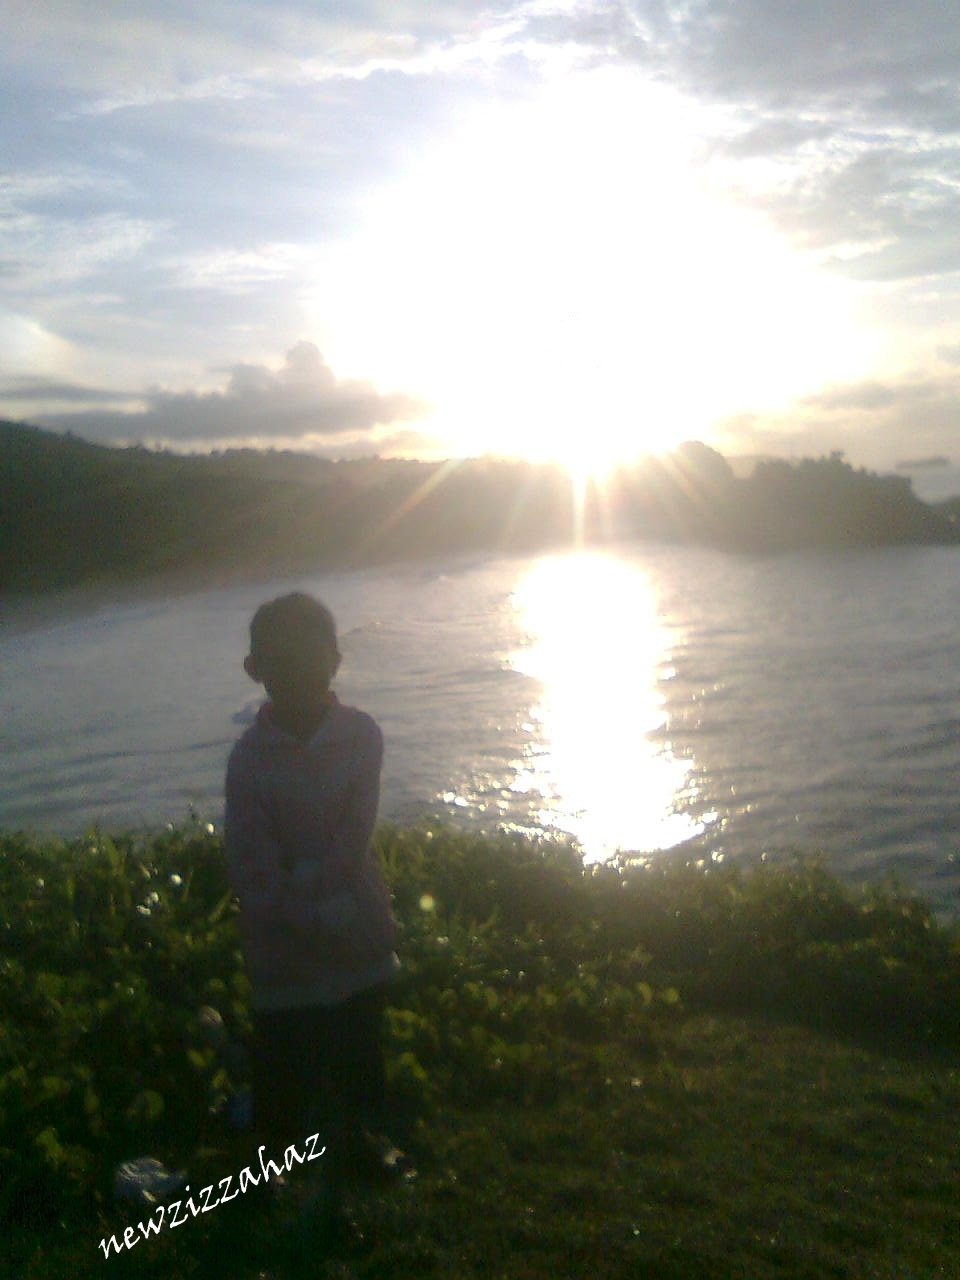 Melihat sunrise di atas pantai Klayar Apa mungkin ya… Pantai Klayar kan pantai selatan… apa mataharinya terbit dari selatan Tidak juga tuh… matahari di